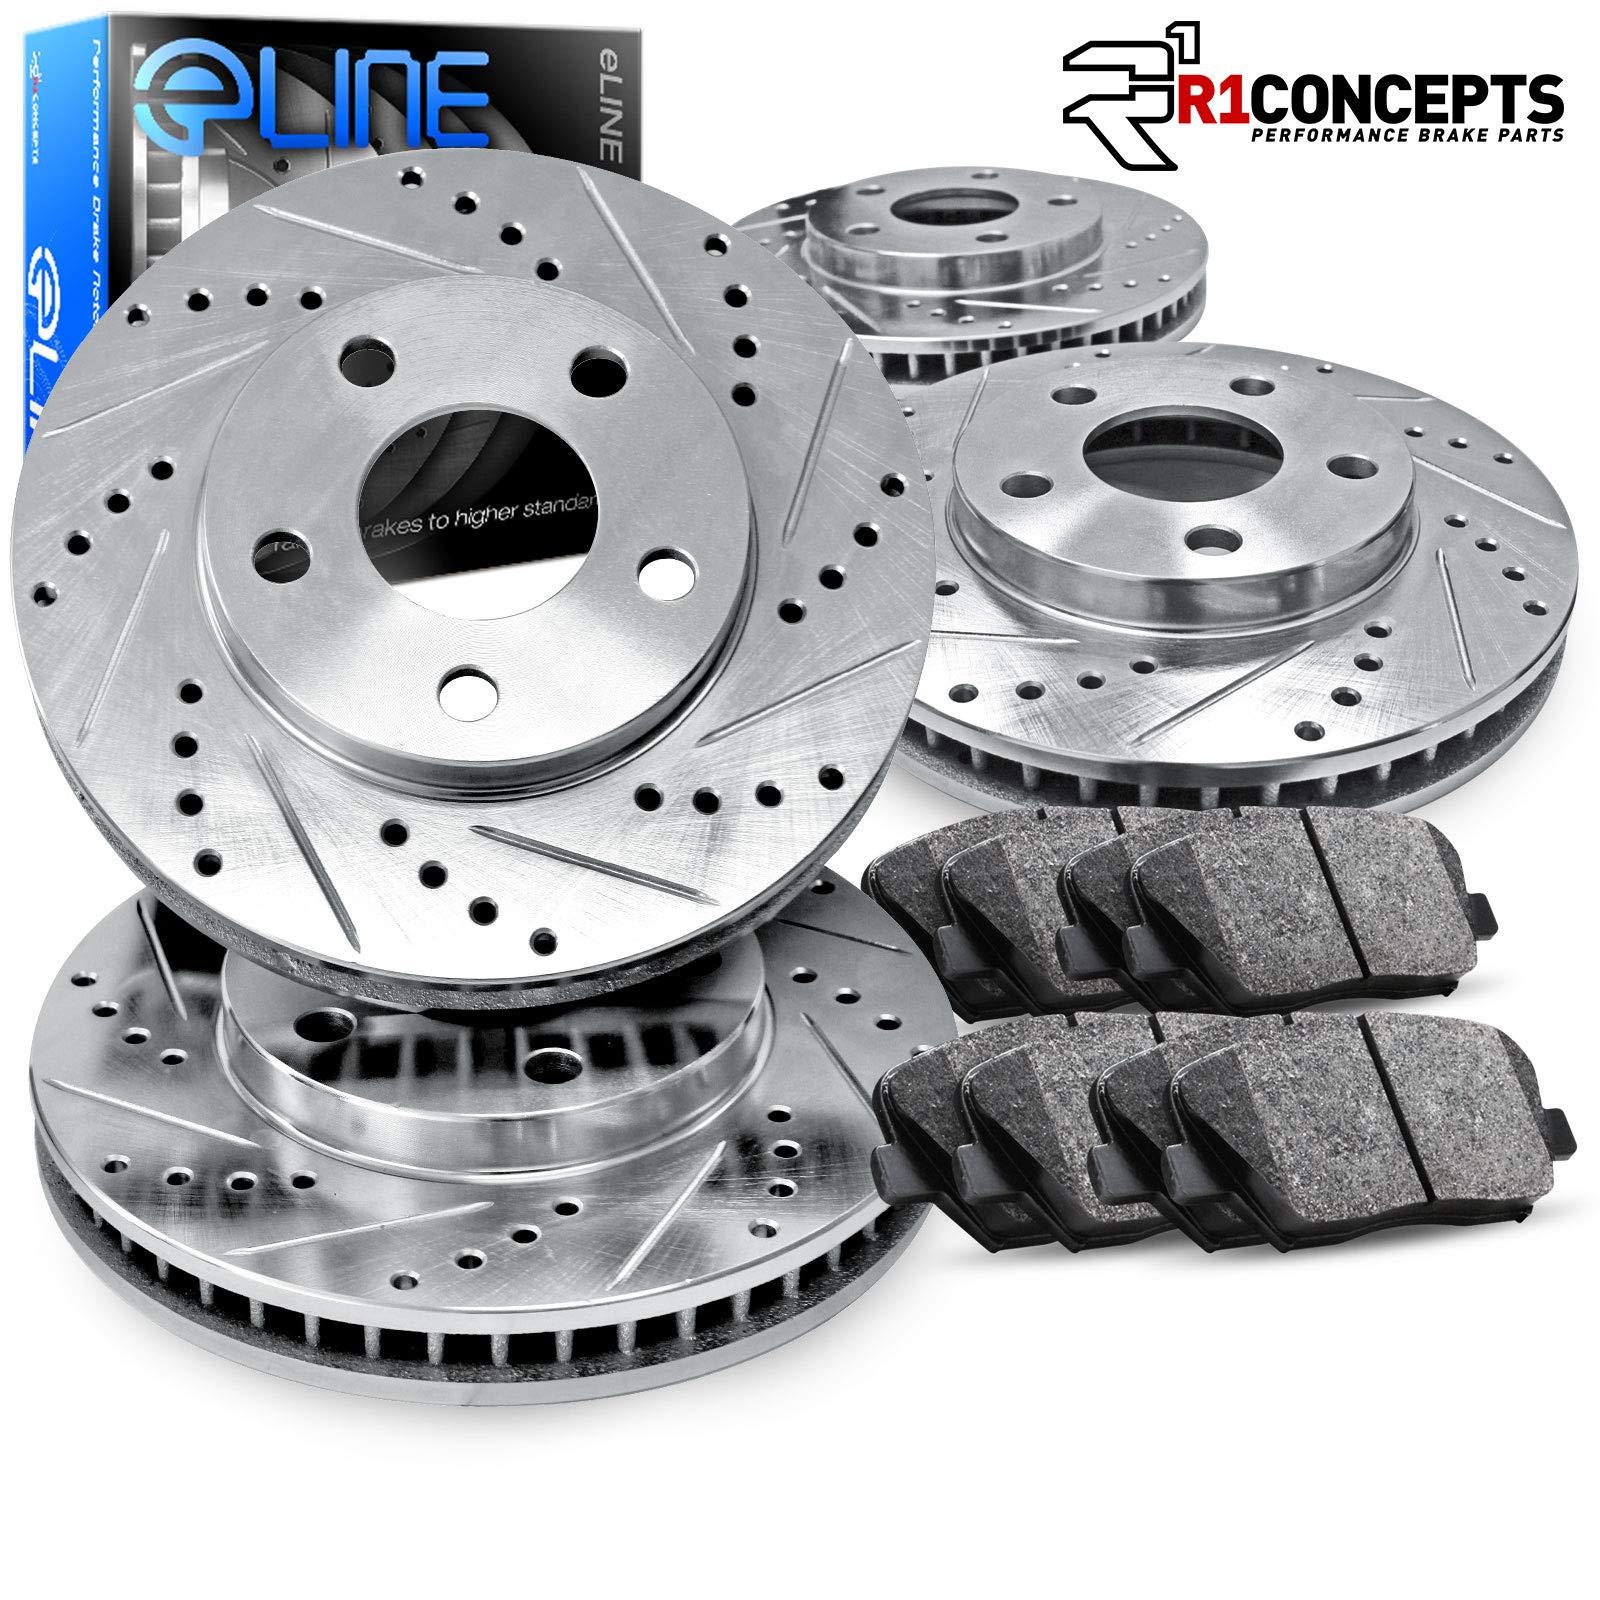 Front Brake Discs Rotors and Ceramic Pads For 2007-2011 Dodge Nitro Drill Slot